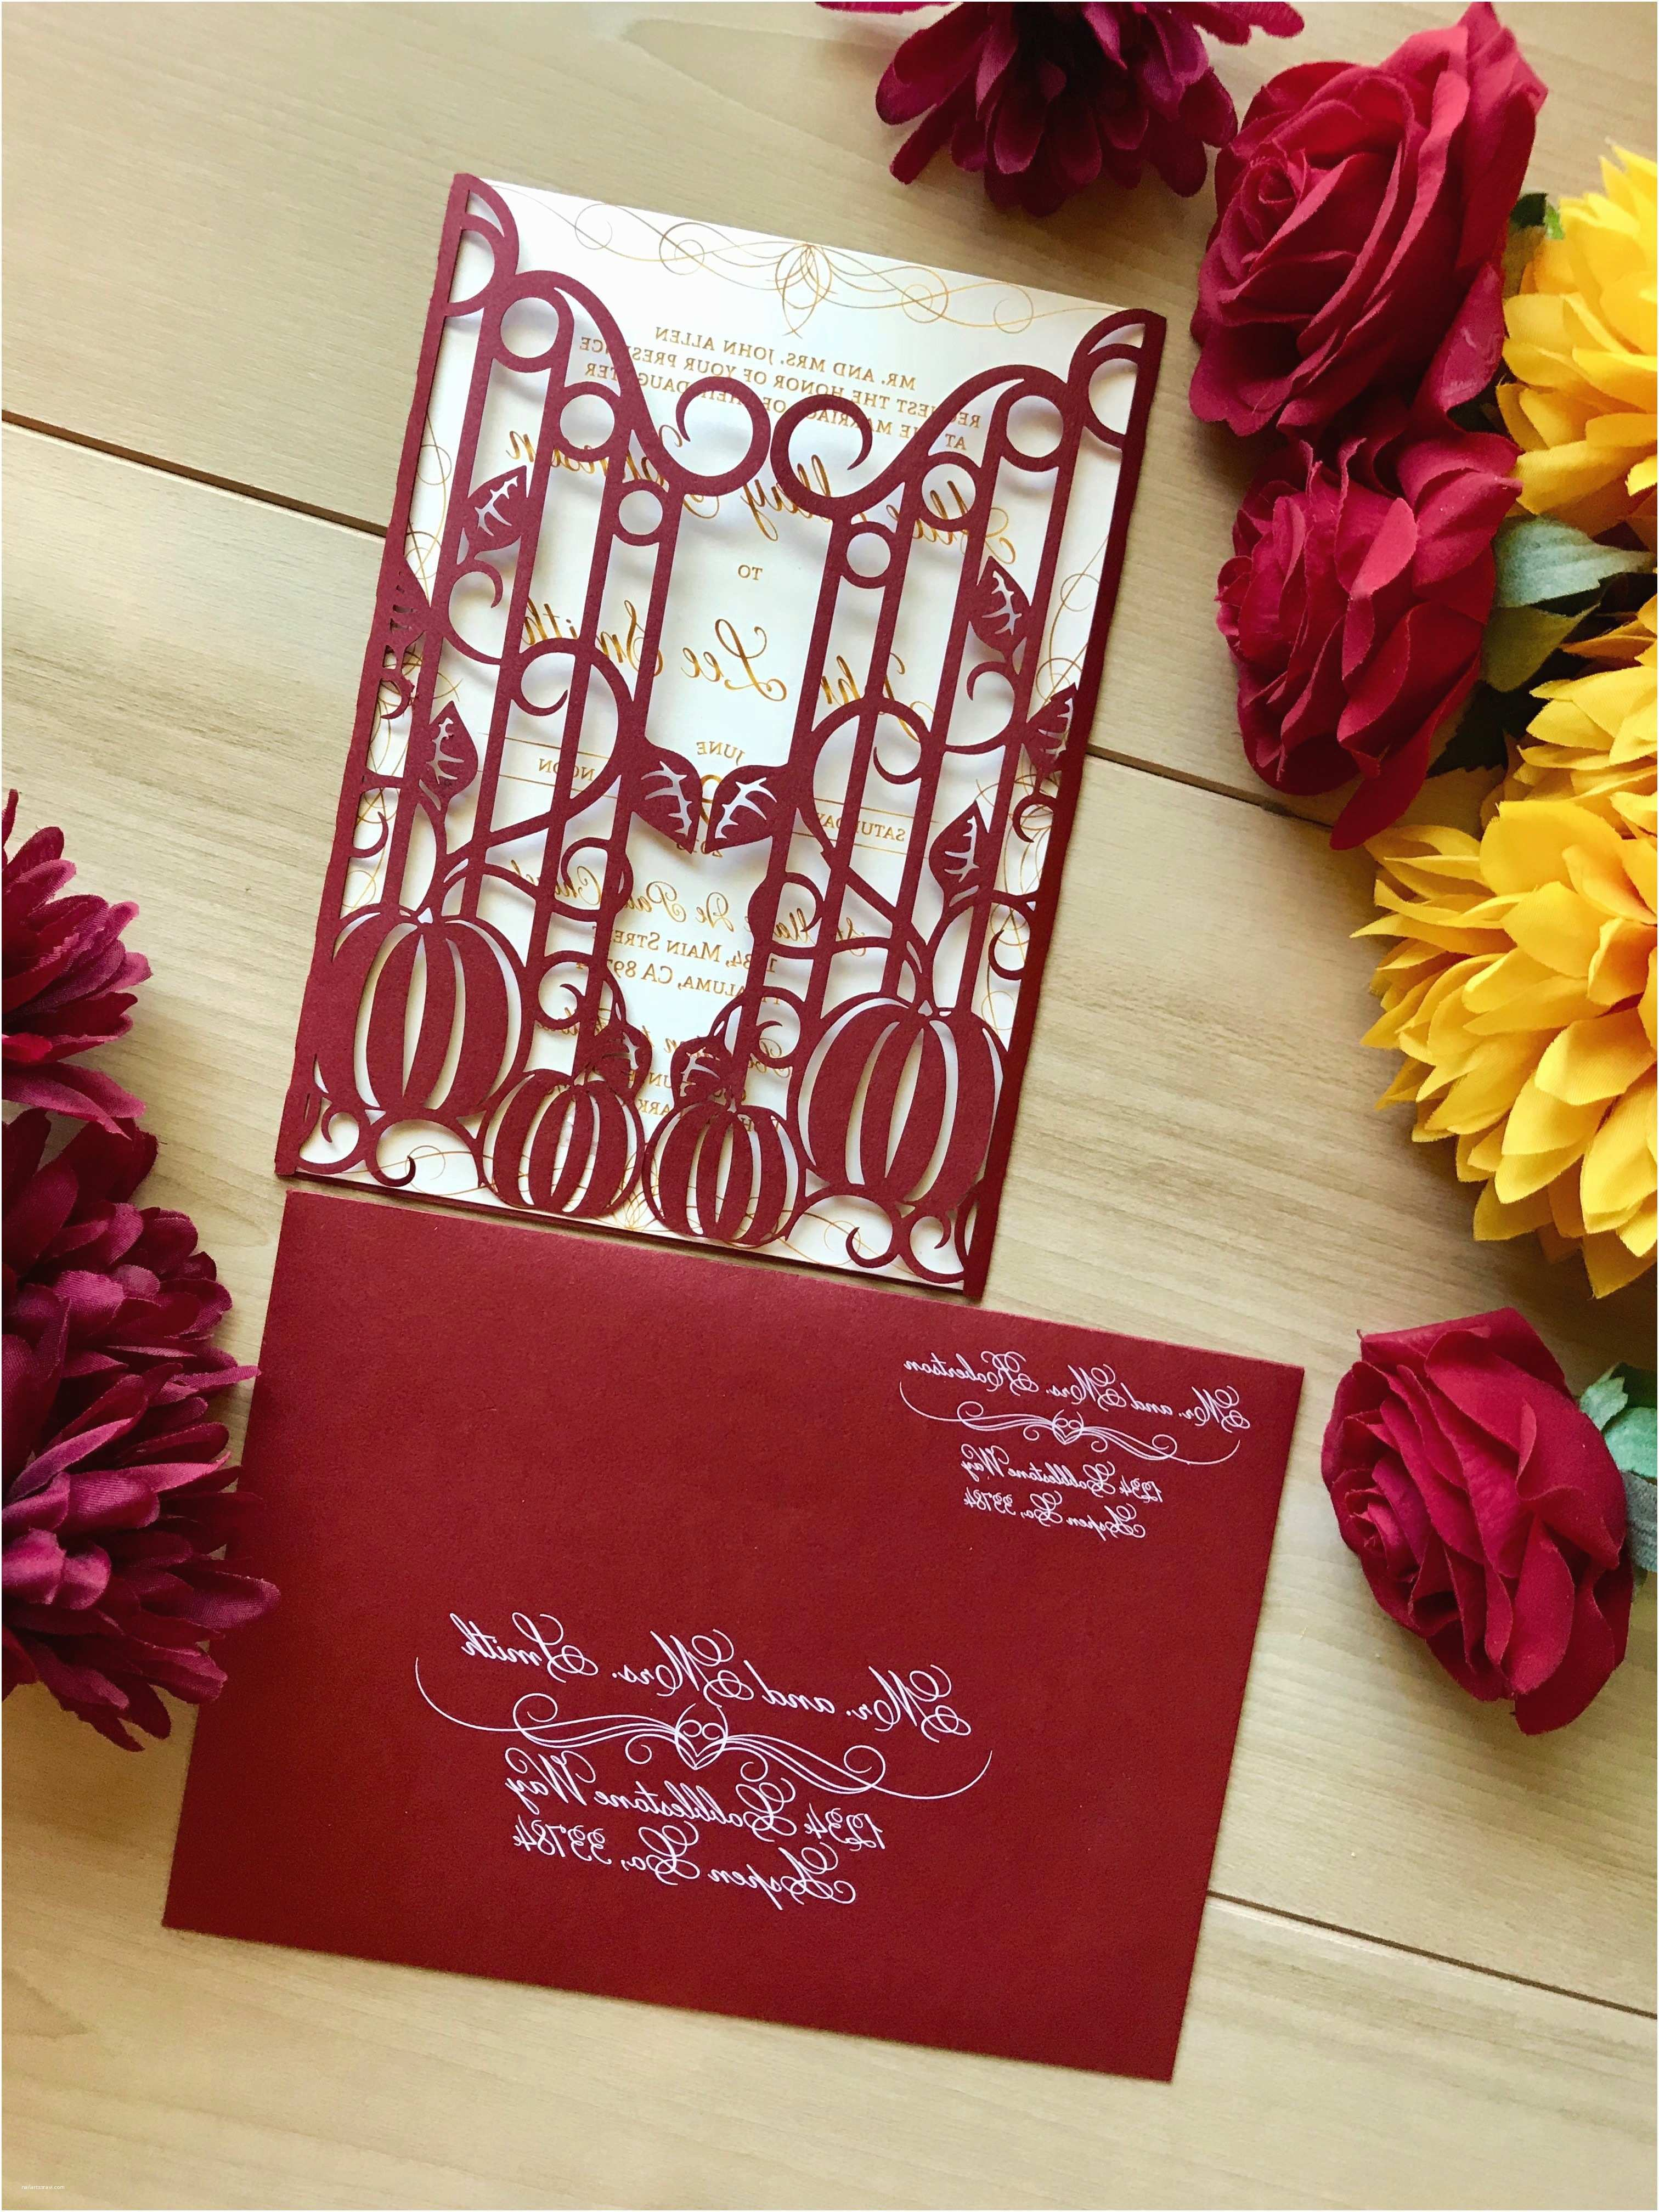 Engraved Wedding Invitations Cost Enchanting Cost For Wedding Invitations